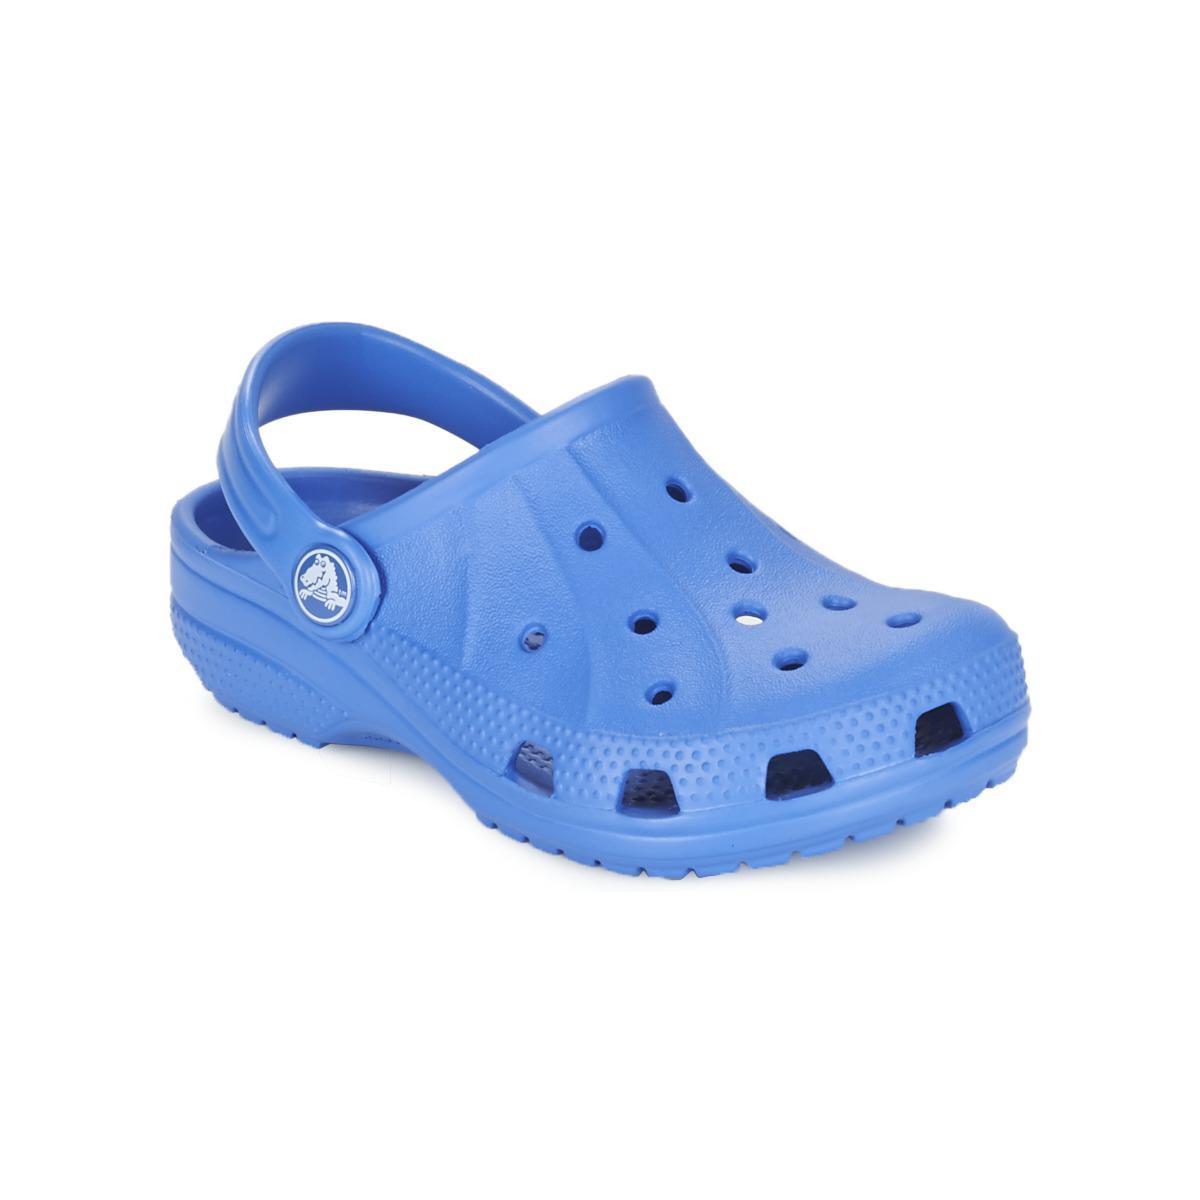 6f968e07b218 Crocs™ Ralen Clog K Men s Clogs (shoes) In Blue in Blue for Men - Lyst